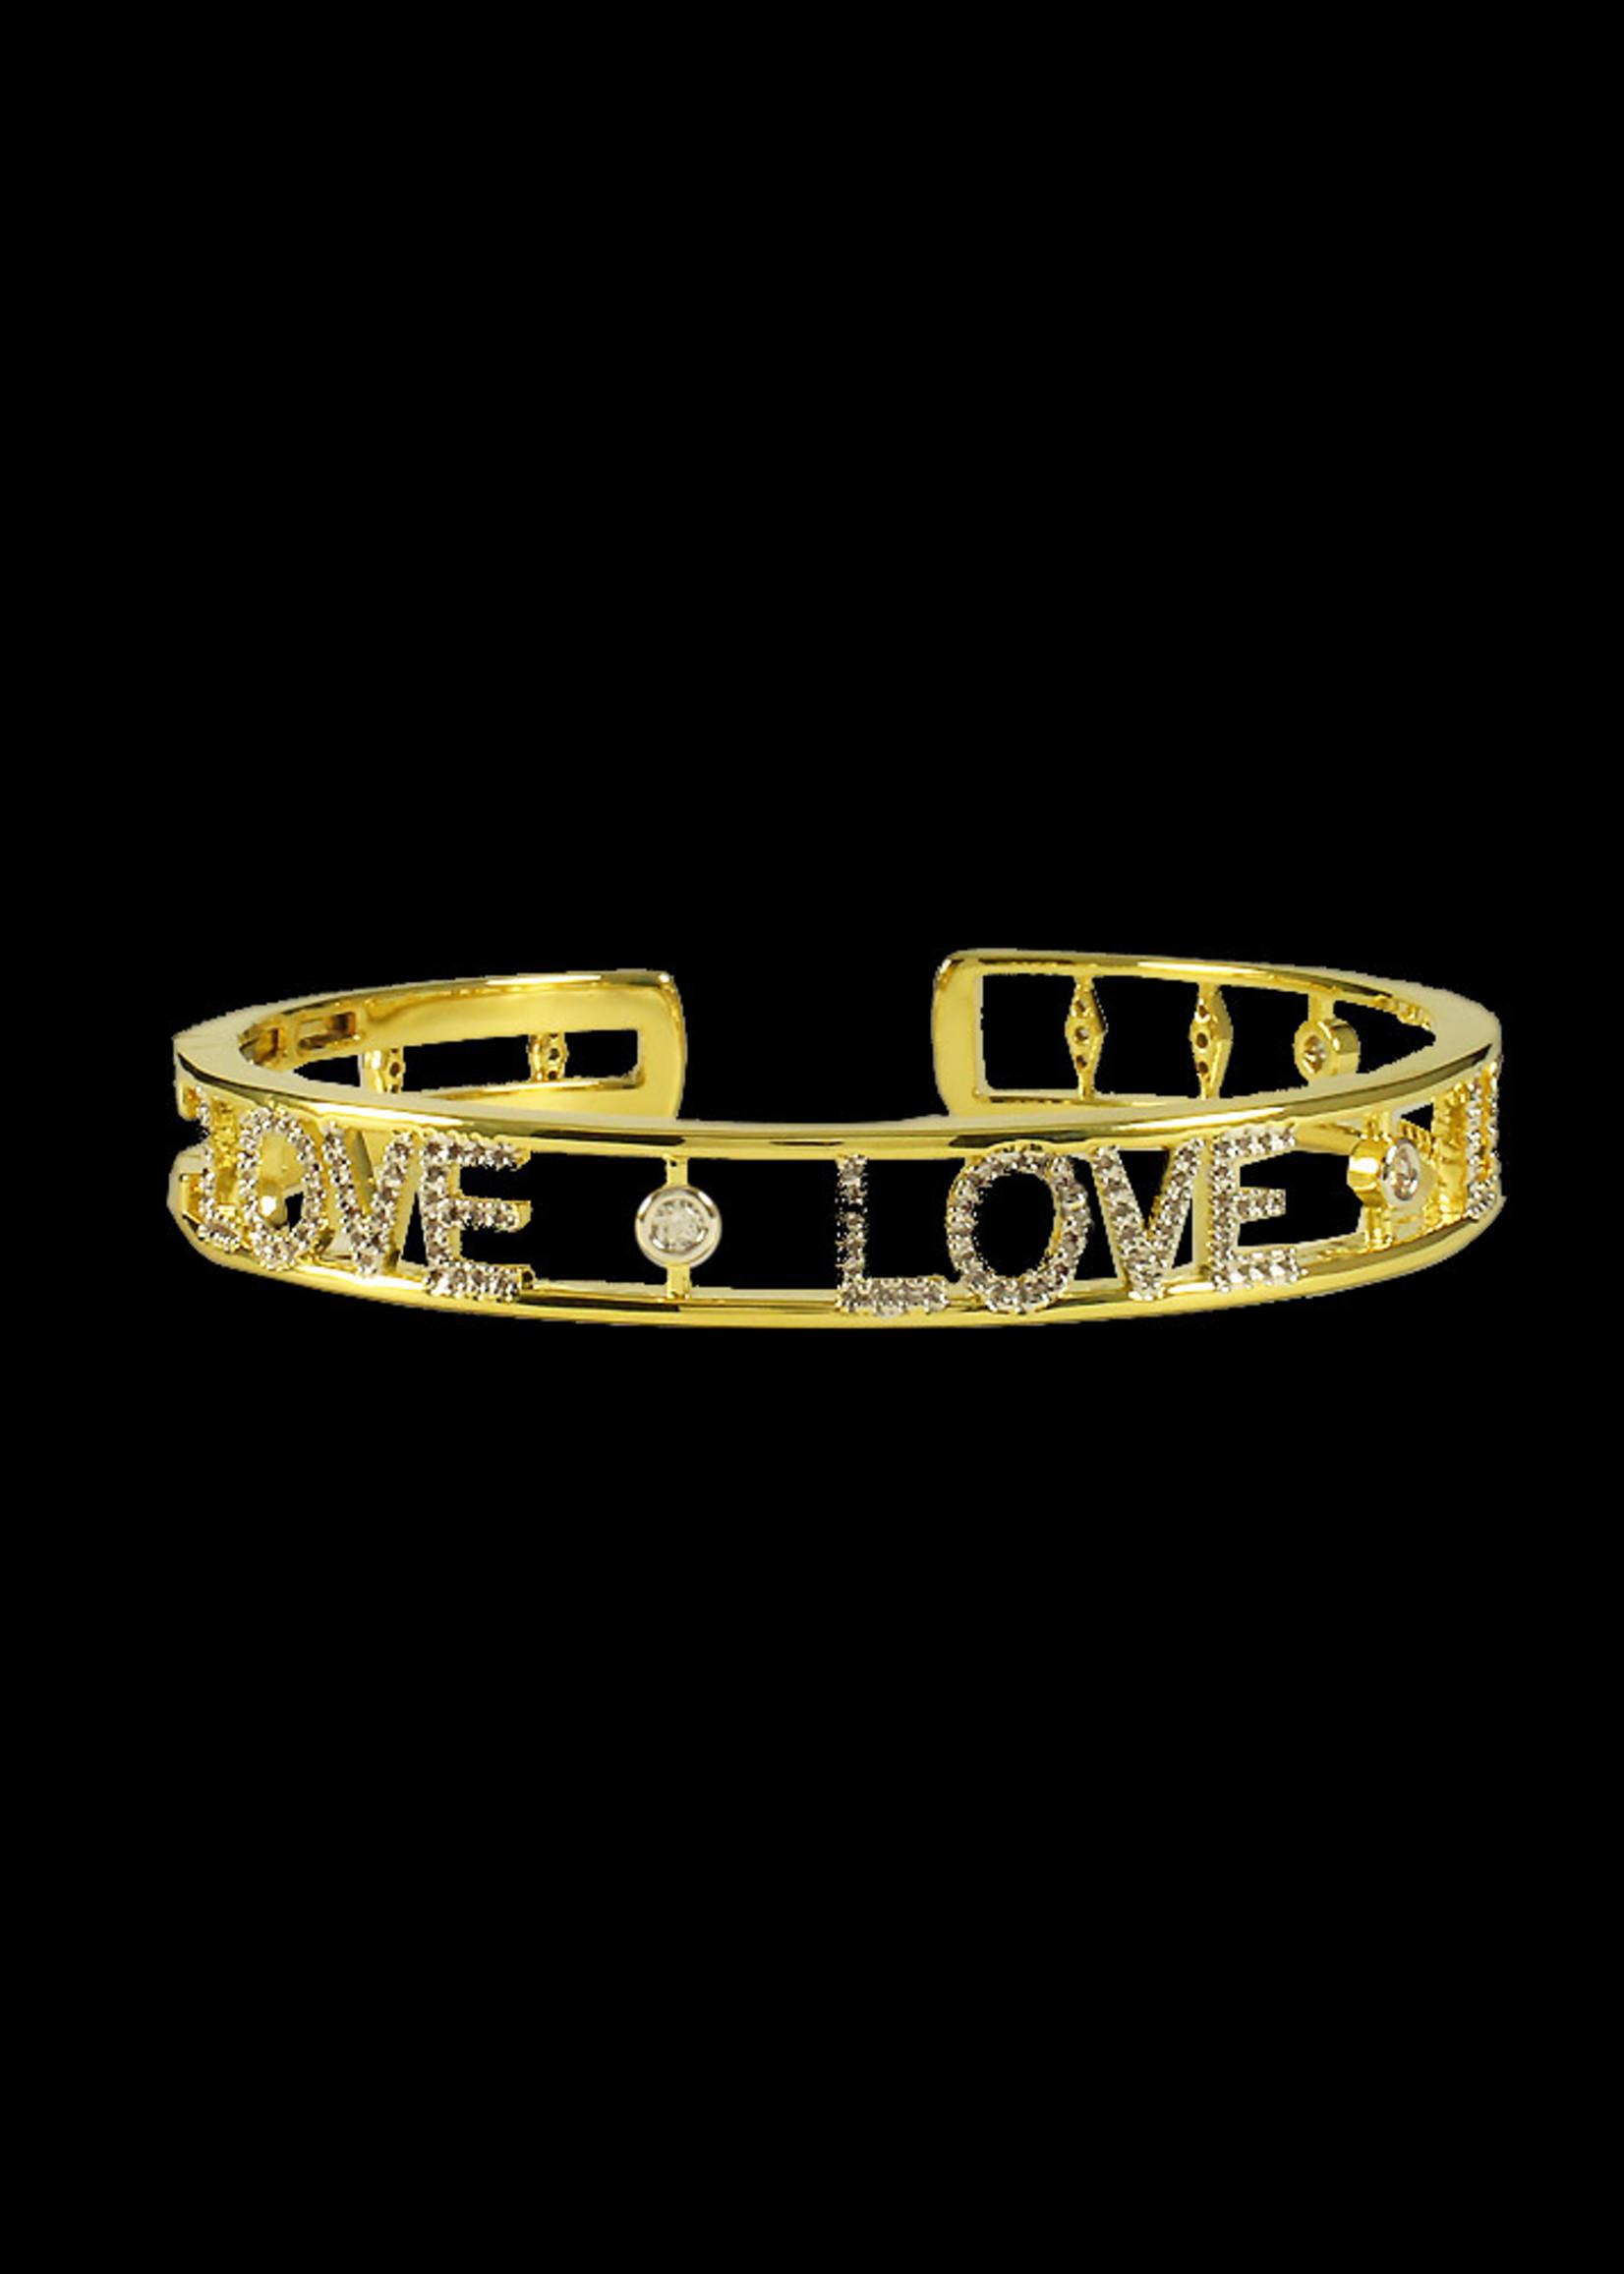 Be-Je Designs Beje - Gold Love Bracelet (PU0848B)